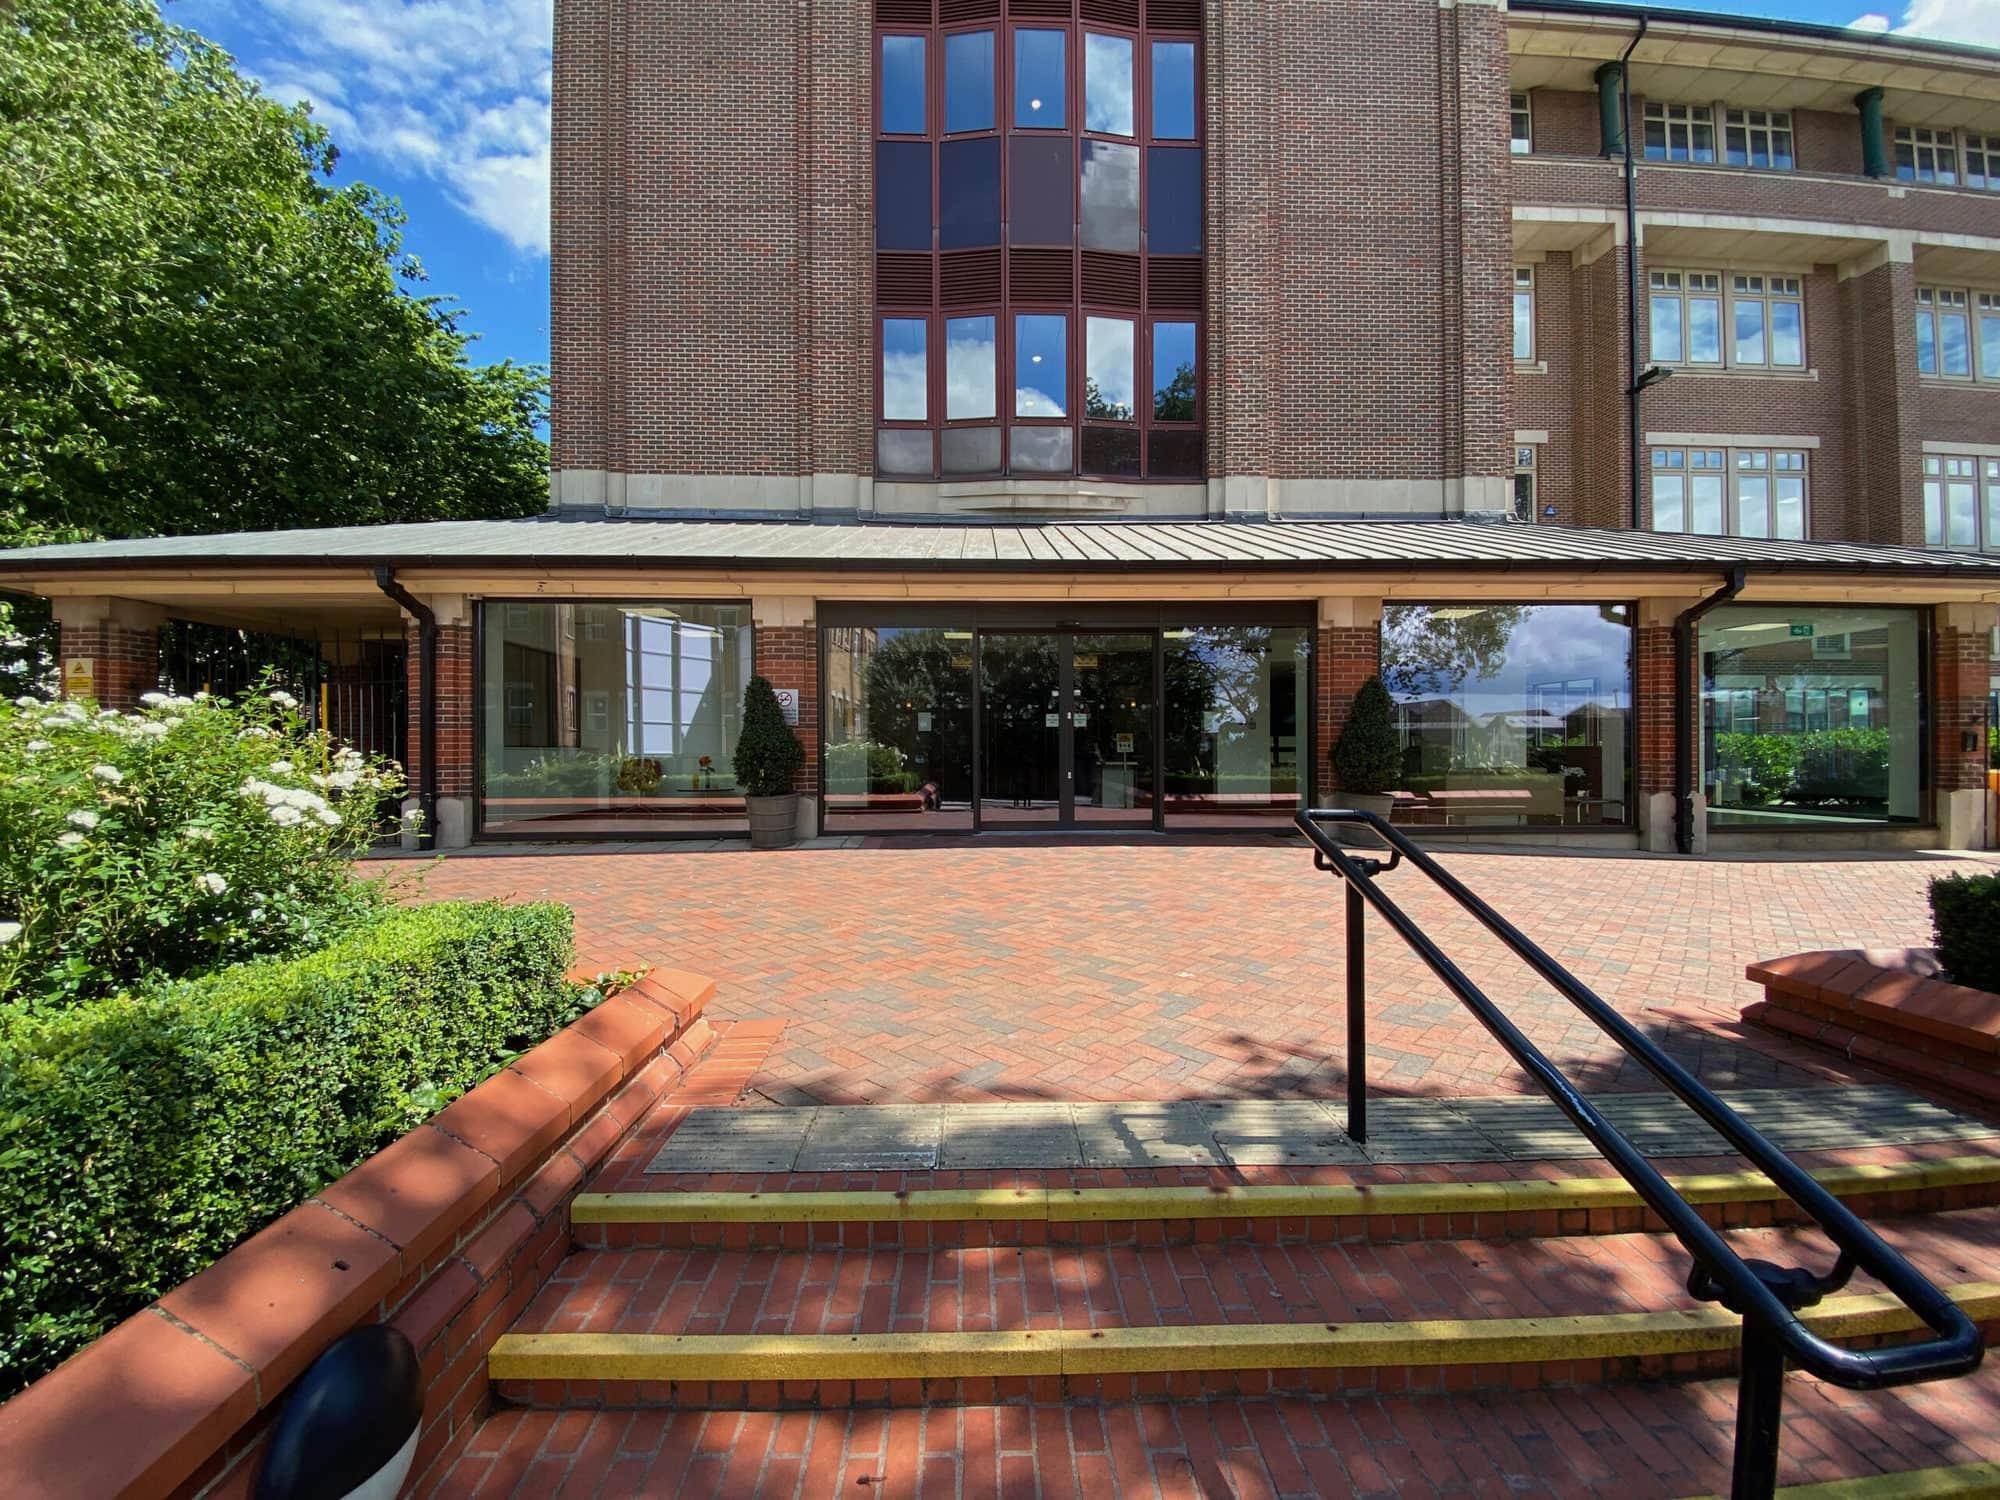 Southgate House Front entrance